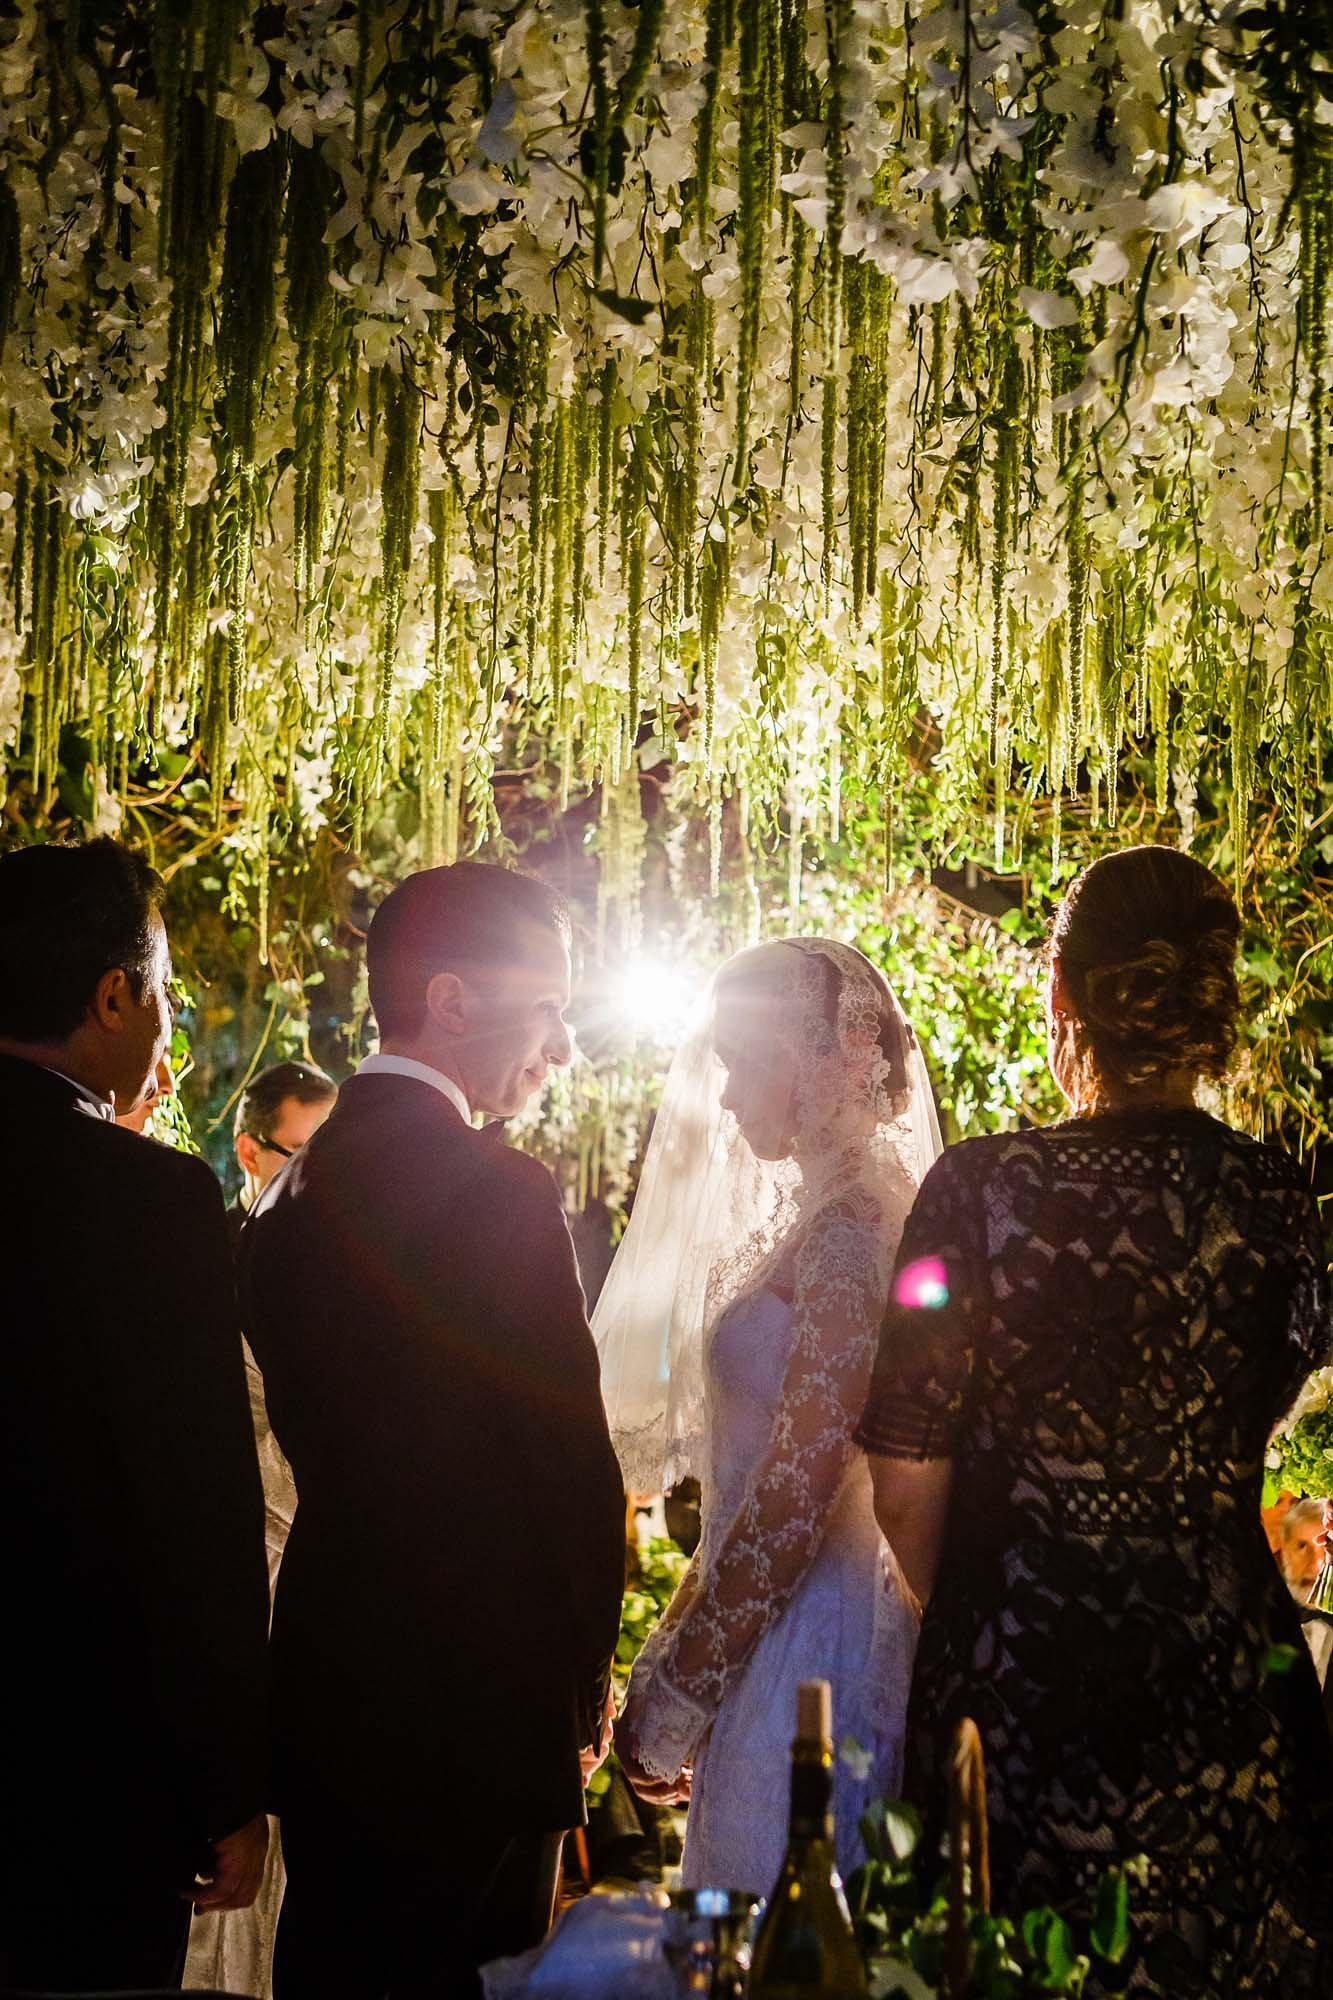 Elizabeth Fisch and Michael Dishis Wedding in New York